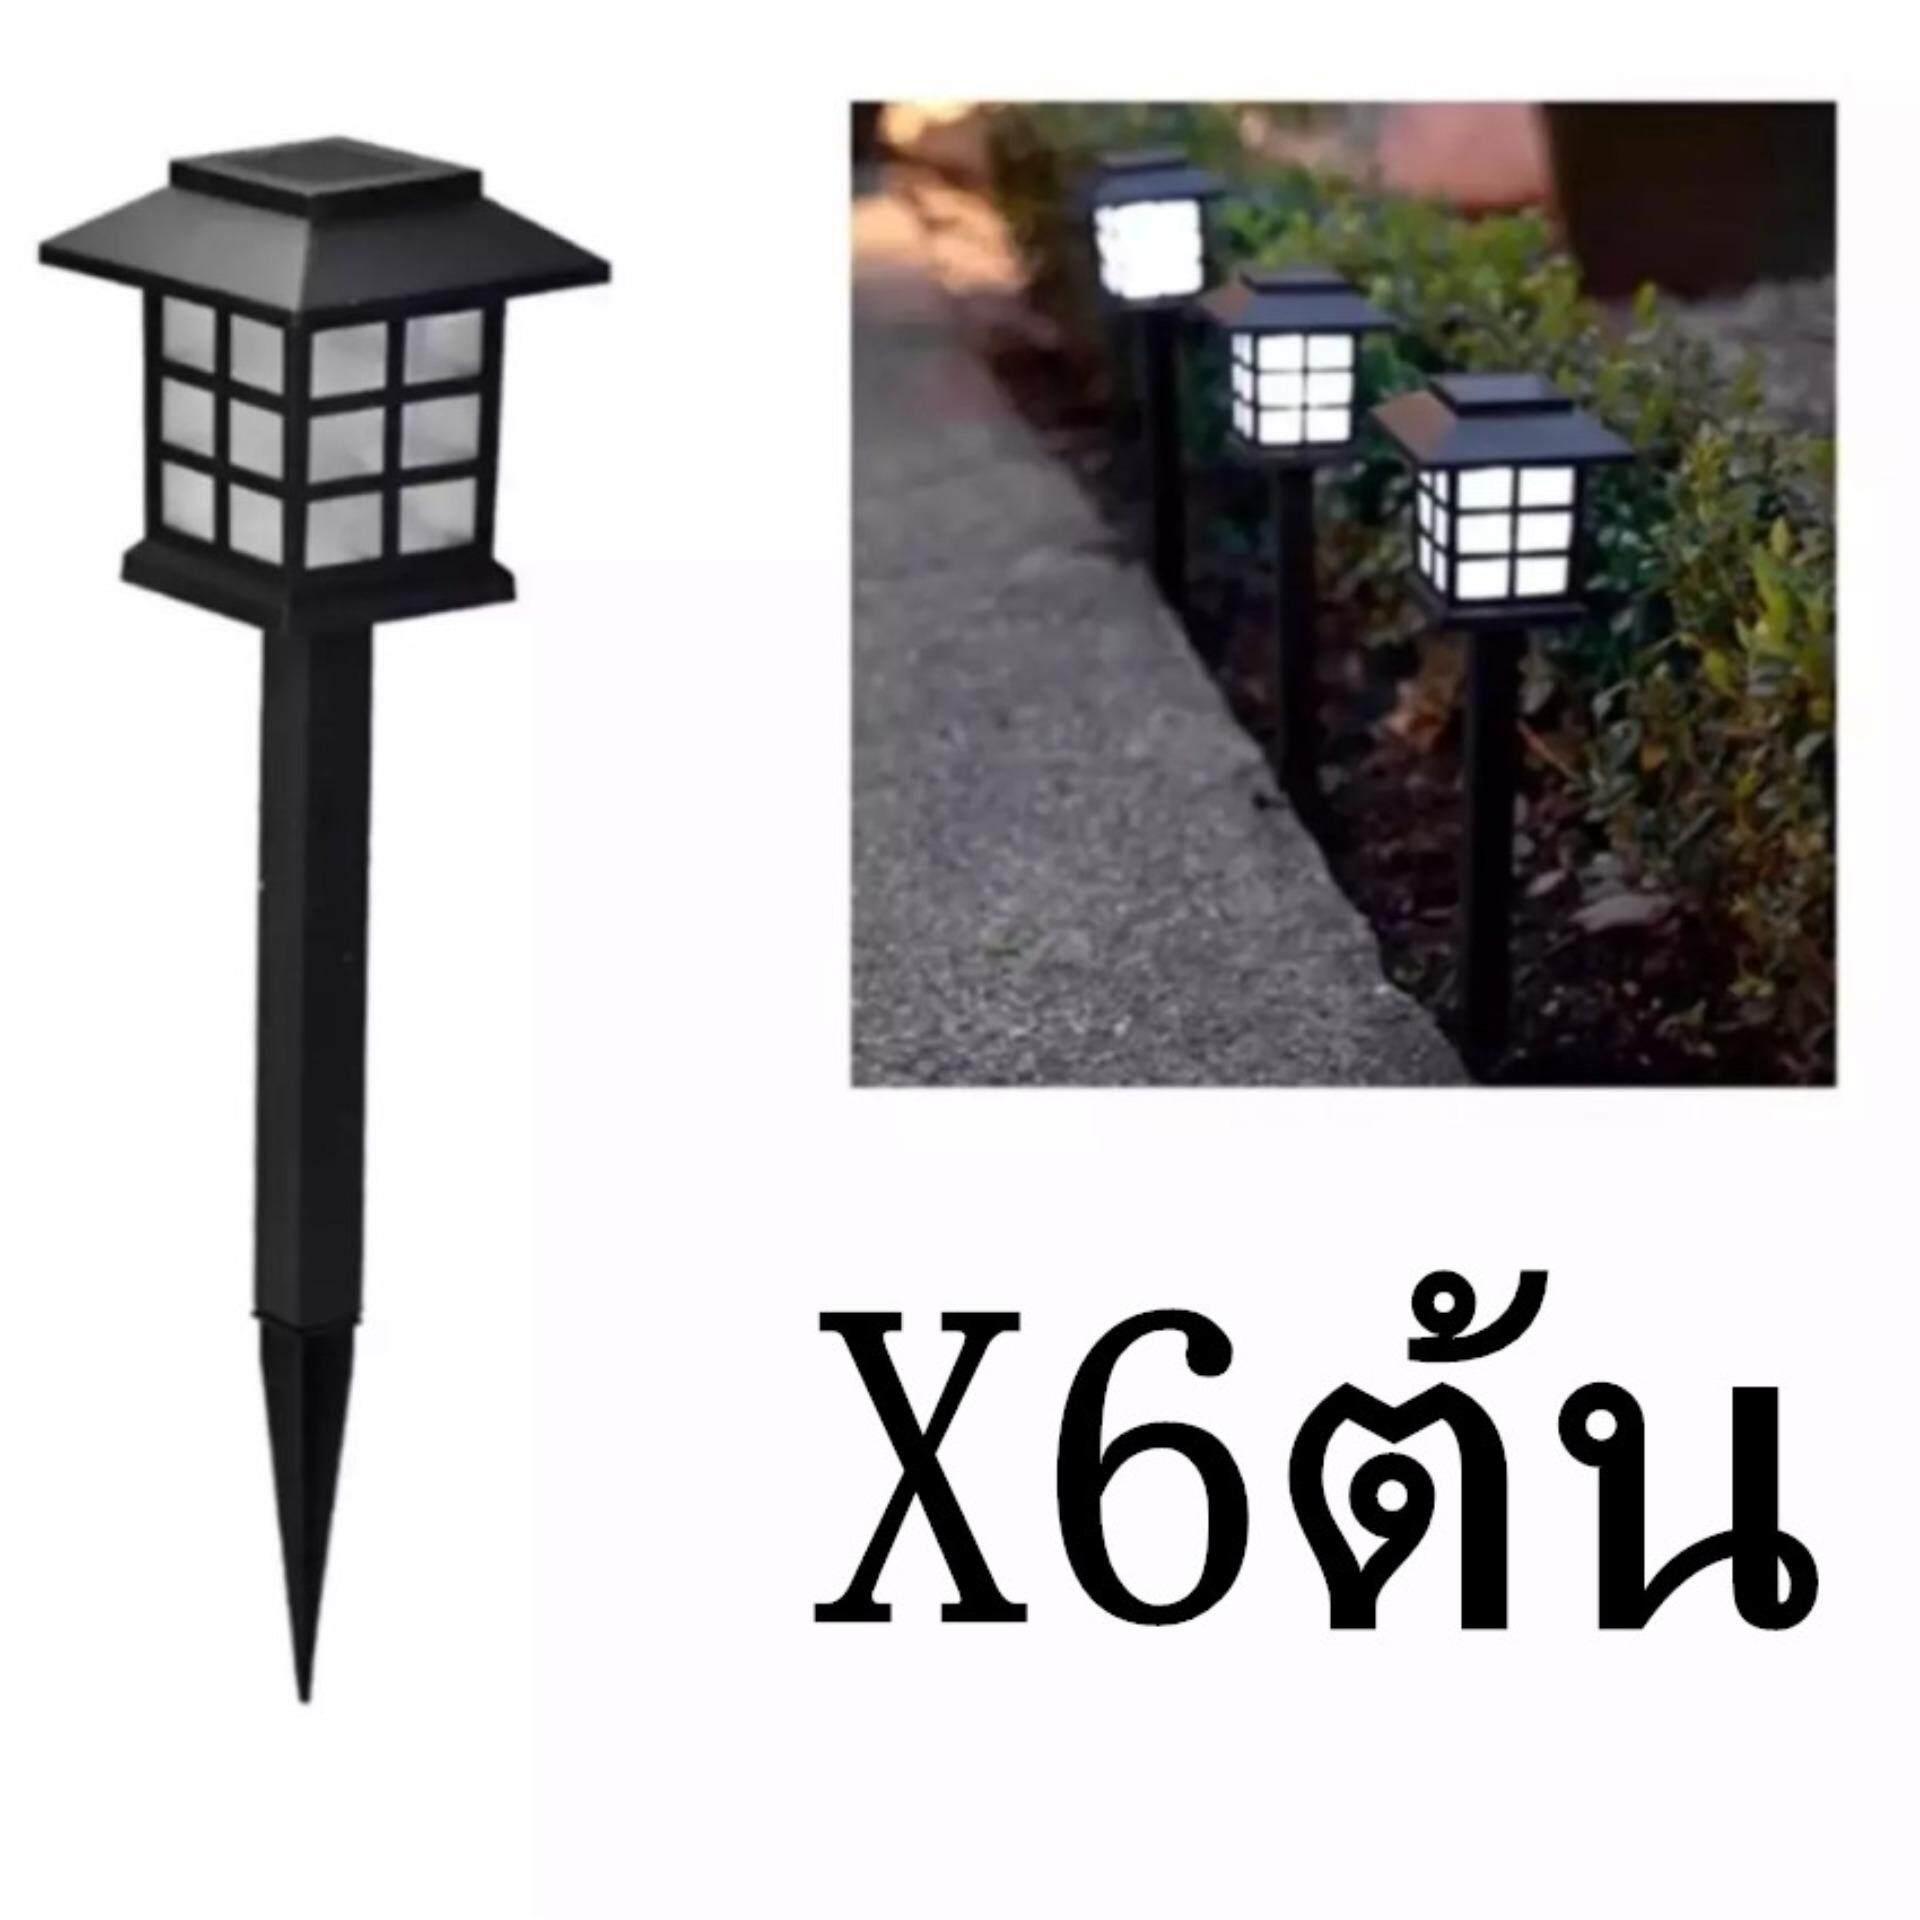 Led Zen Coolwhite ไฟทรงโคมญี่ปุ่นพลังงานแสงอาทิตย์ รุ่น:tyn002 (โทนแสงขาวเย็น)6ต้น .